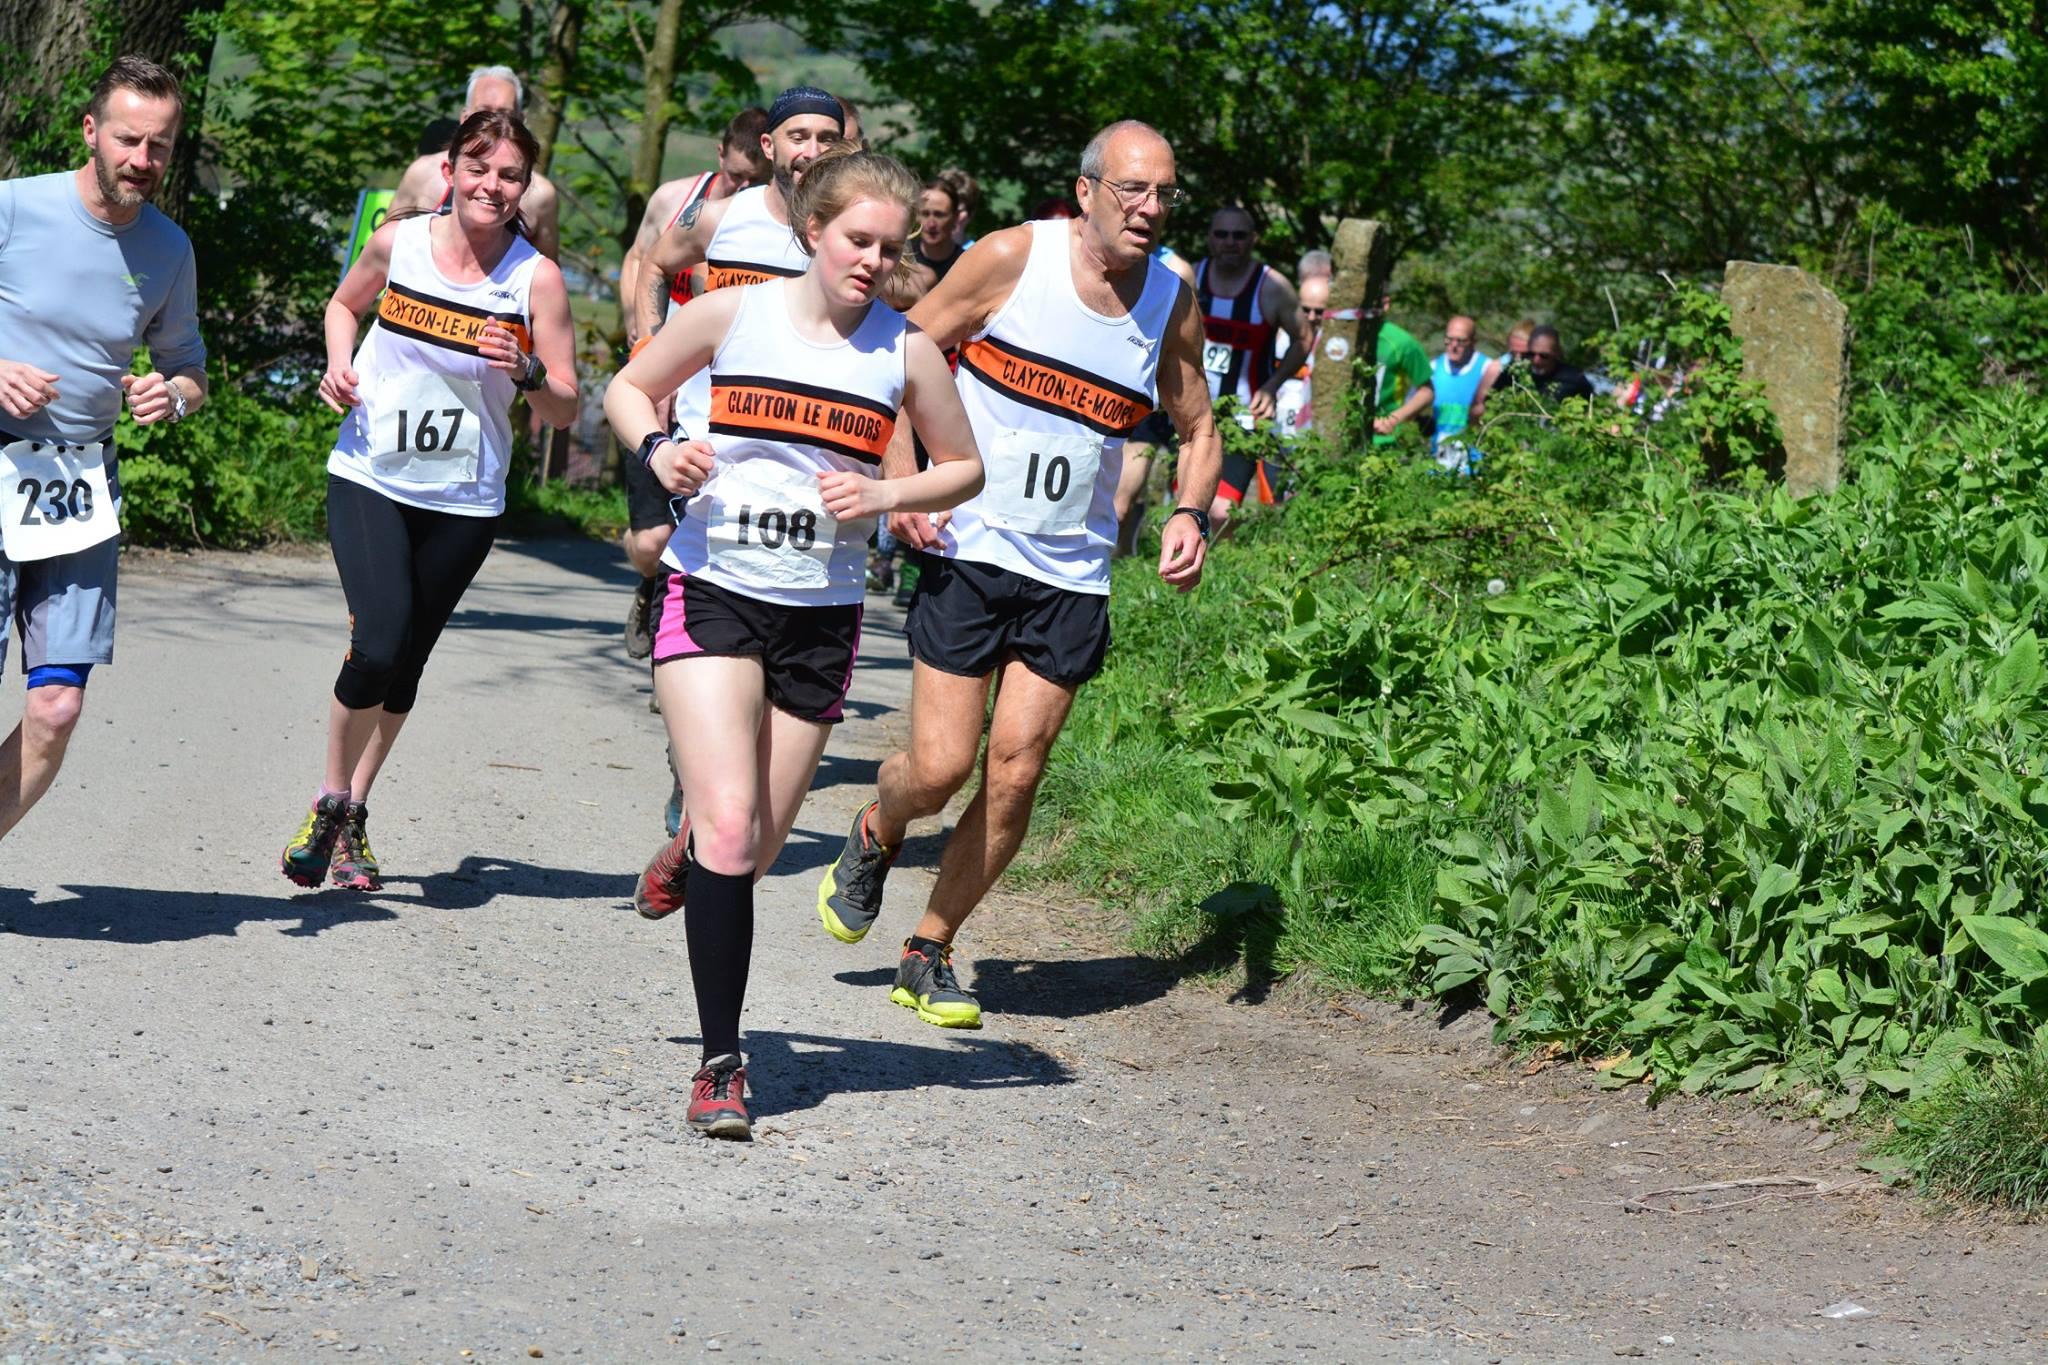 Runners heading up the first climb. Photo by Adrienne Olszewska